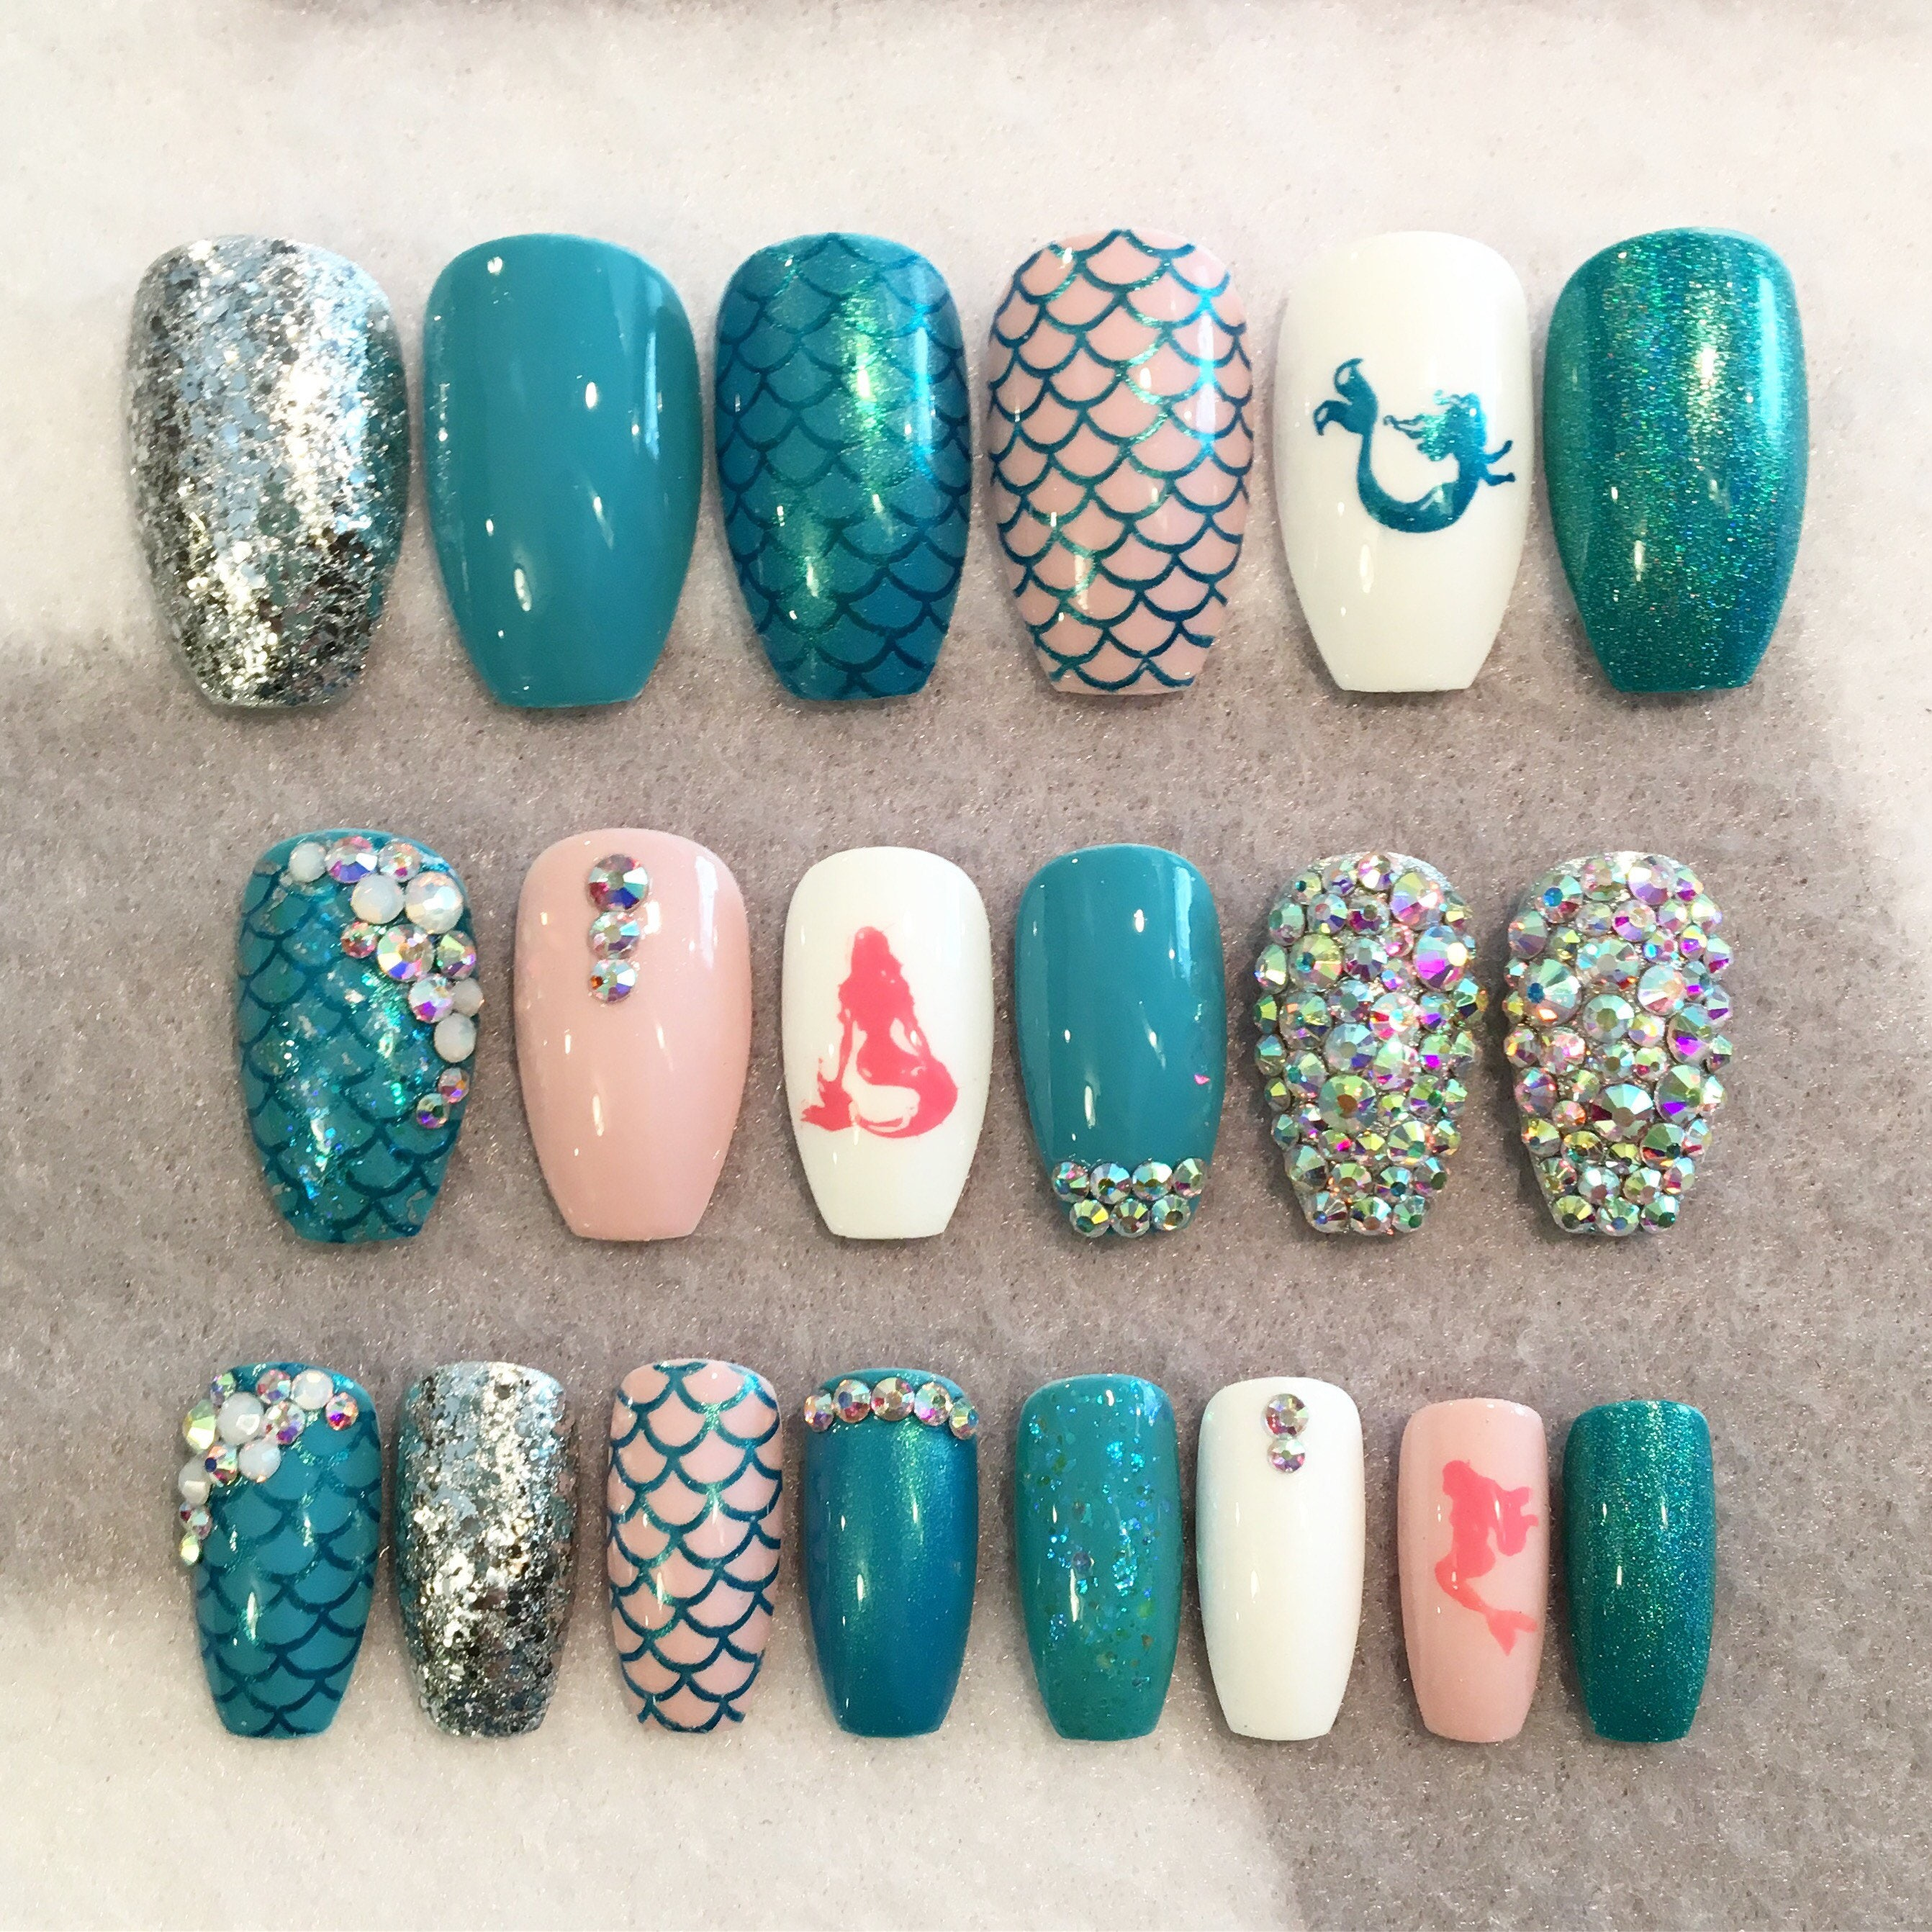 Blue Mermaid Fake Nails * Faux Nails * Glue On Nails * Blue * Pink ...